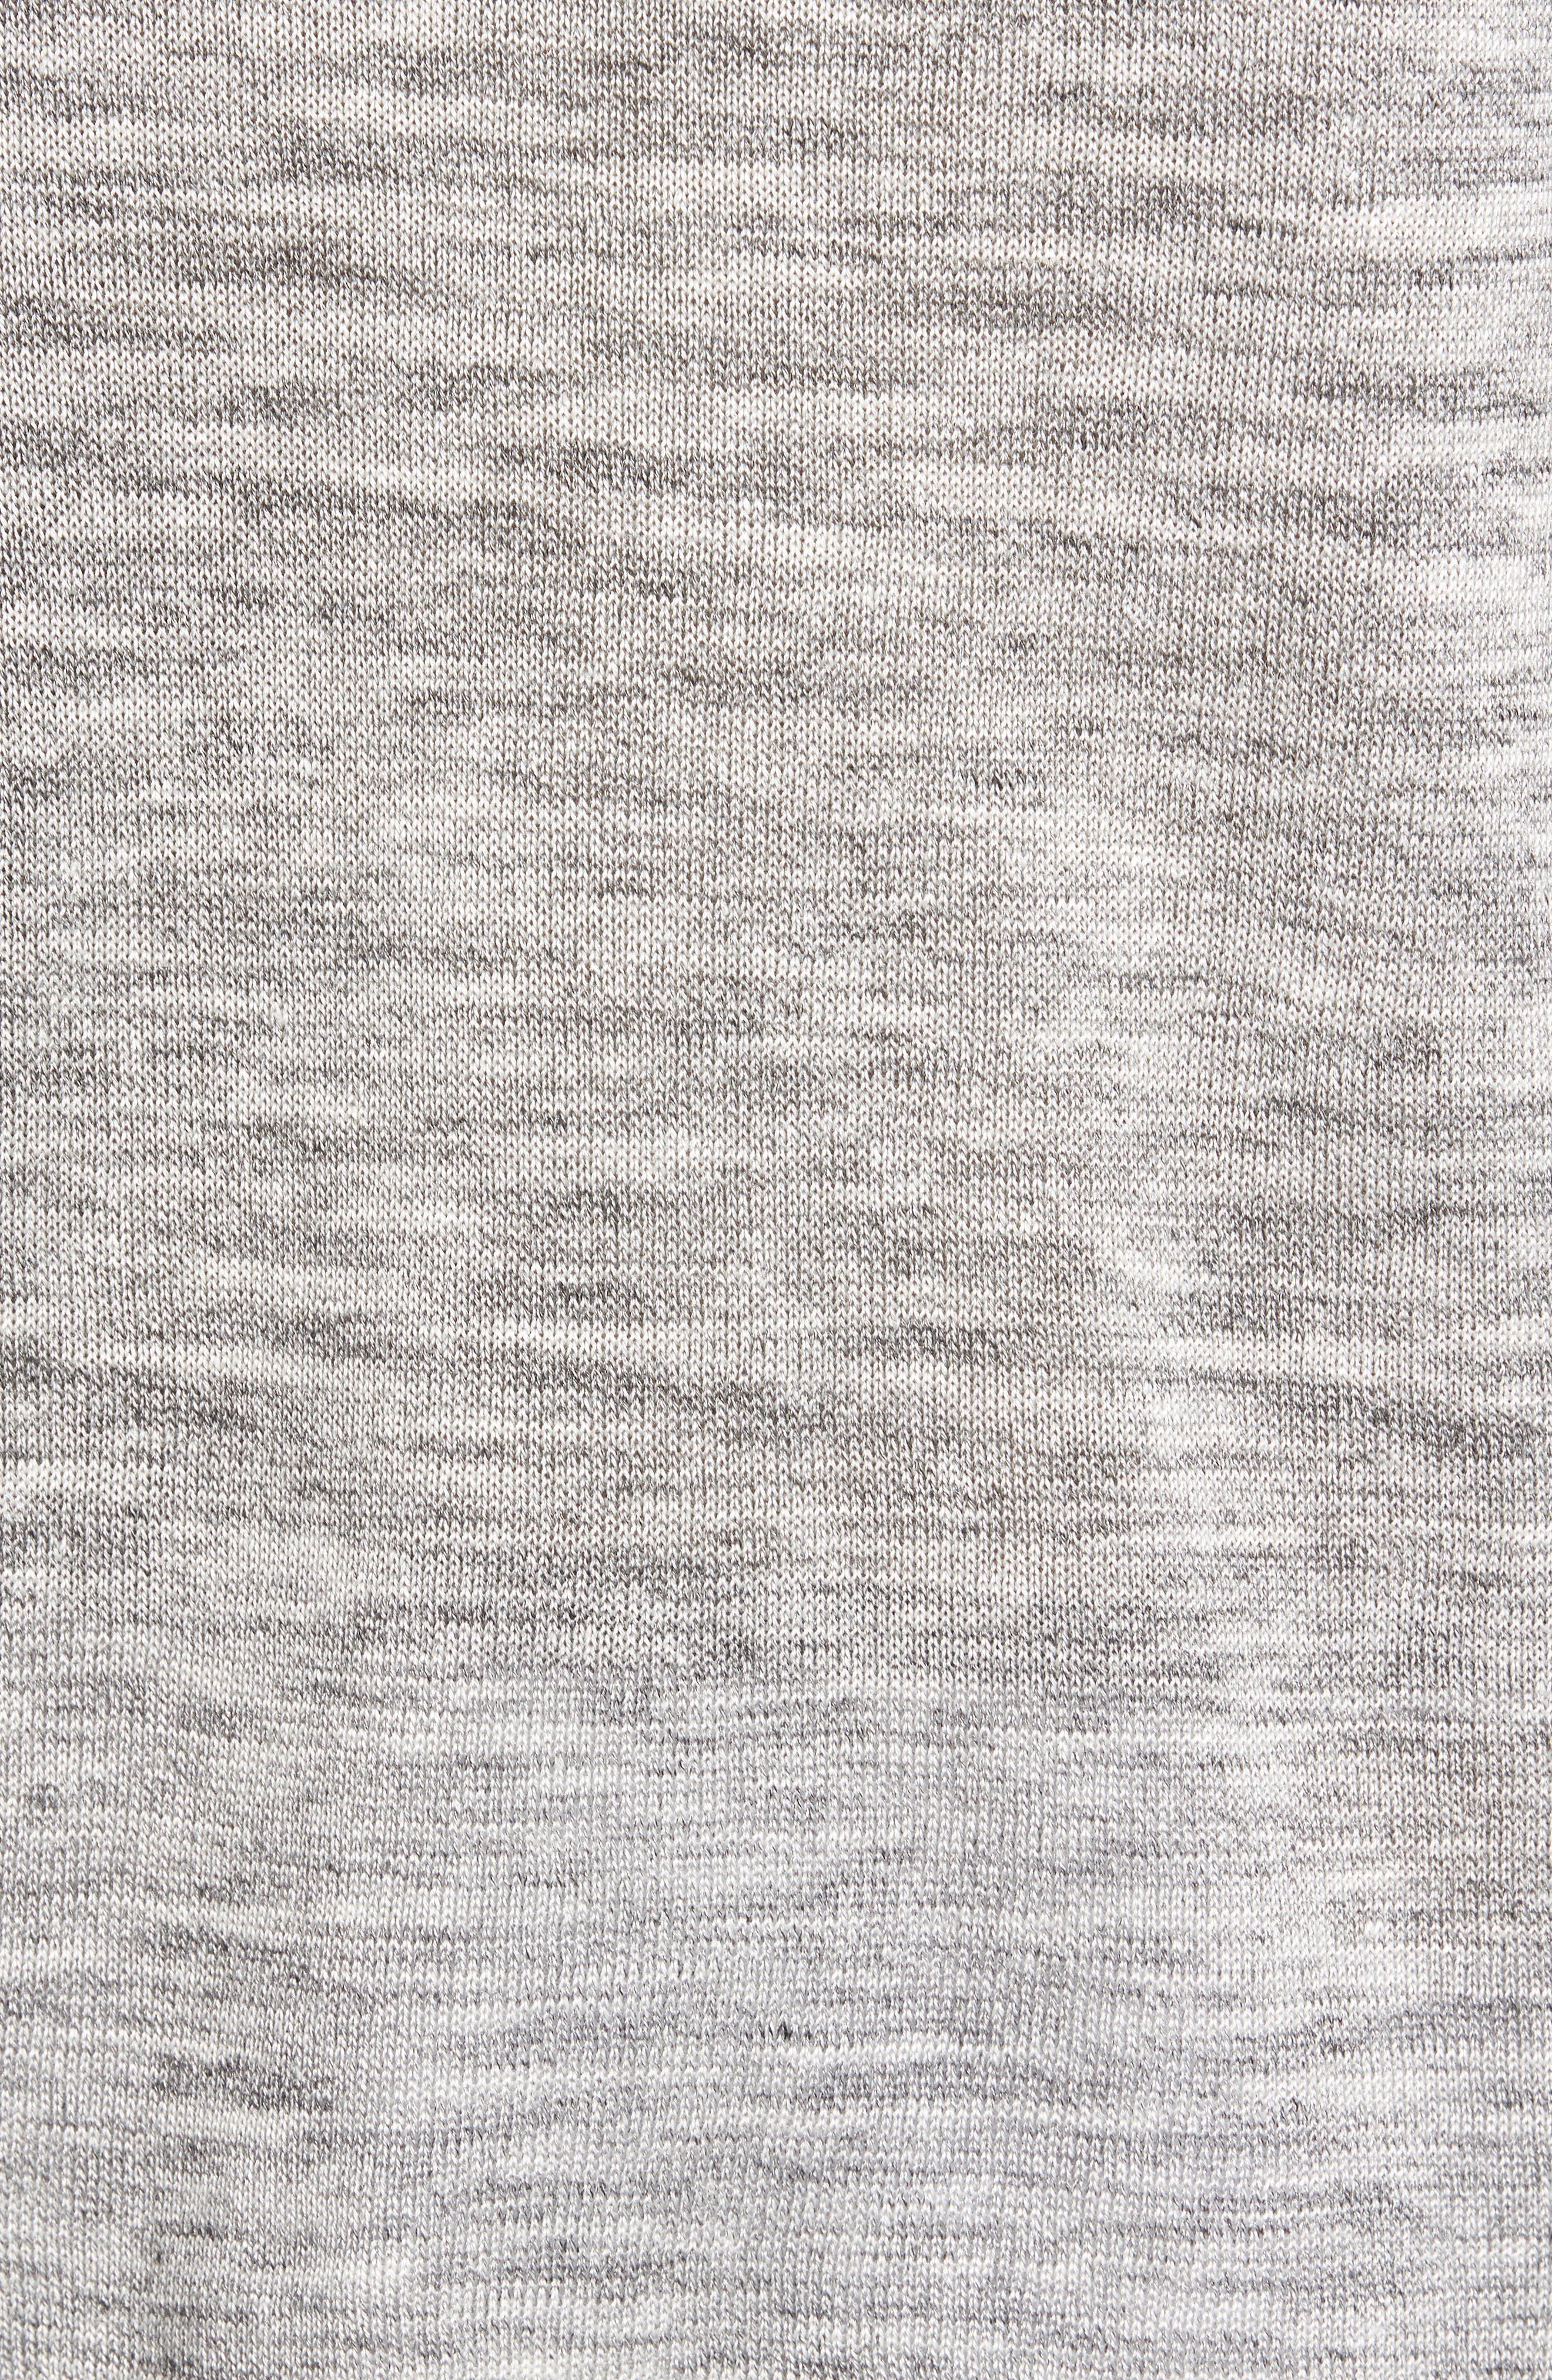 Inzone Crewneck Linen Blend Sweater,                             Alternate thumbnail 5, color,                             050